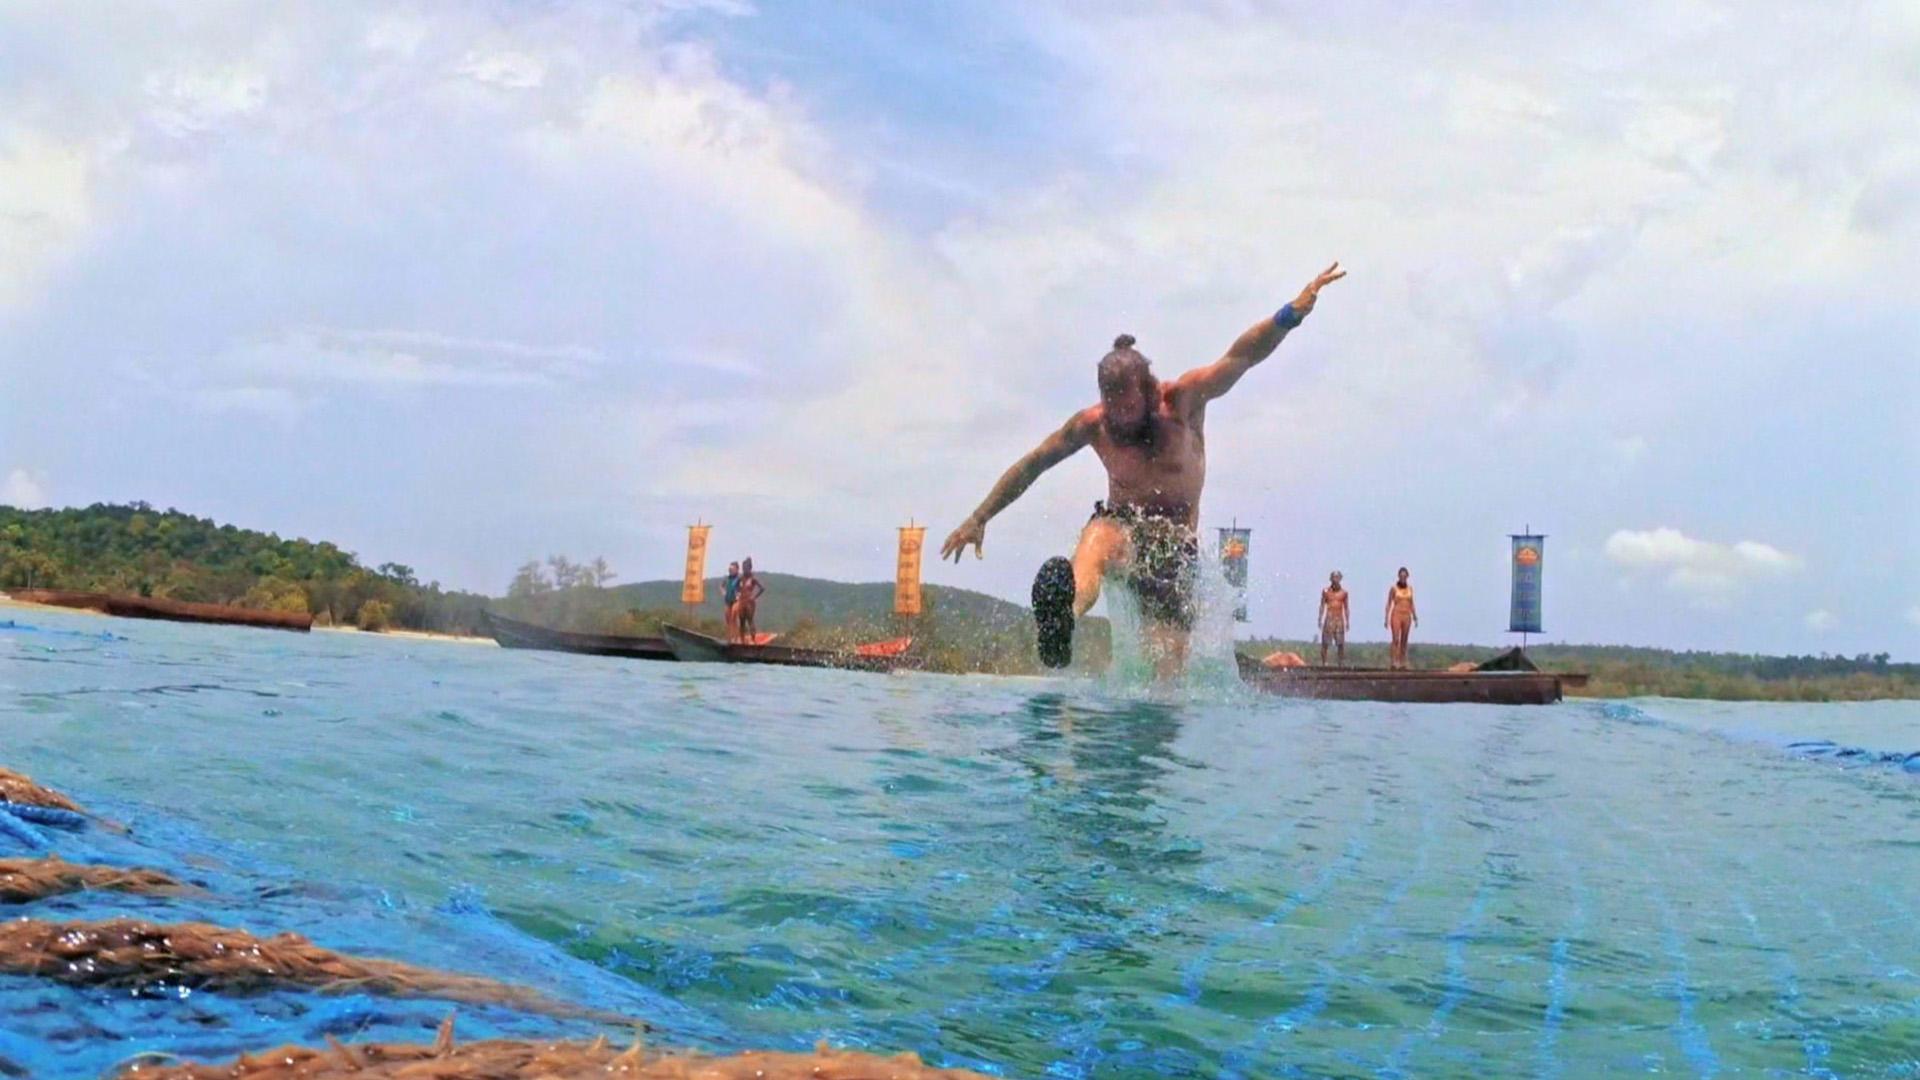 Jason dives in feet first during the Reward Challenge.